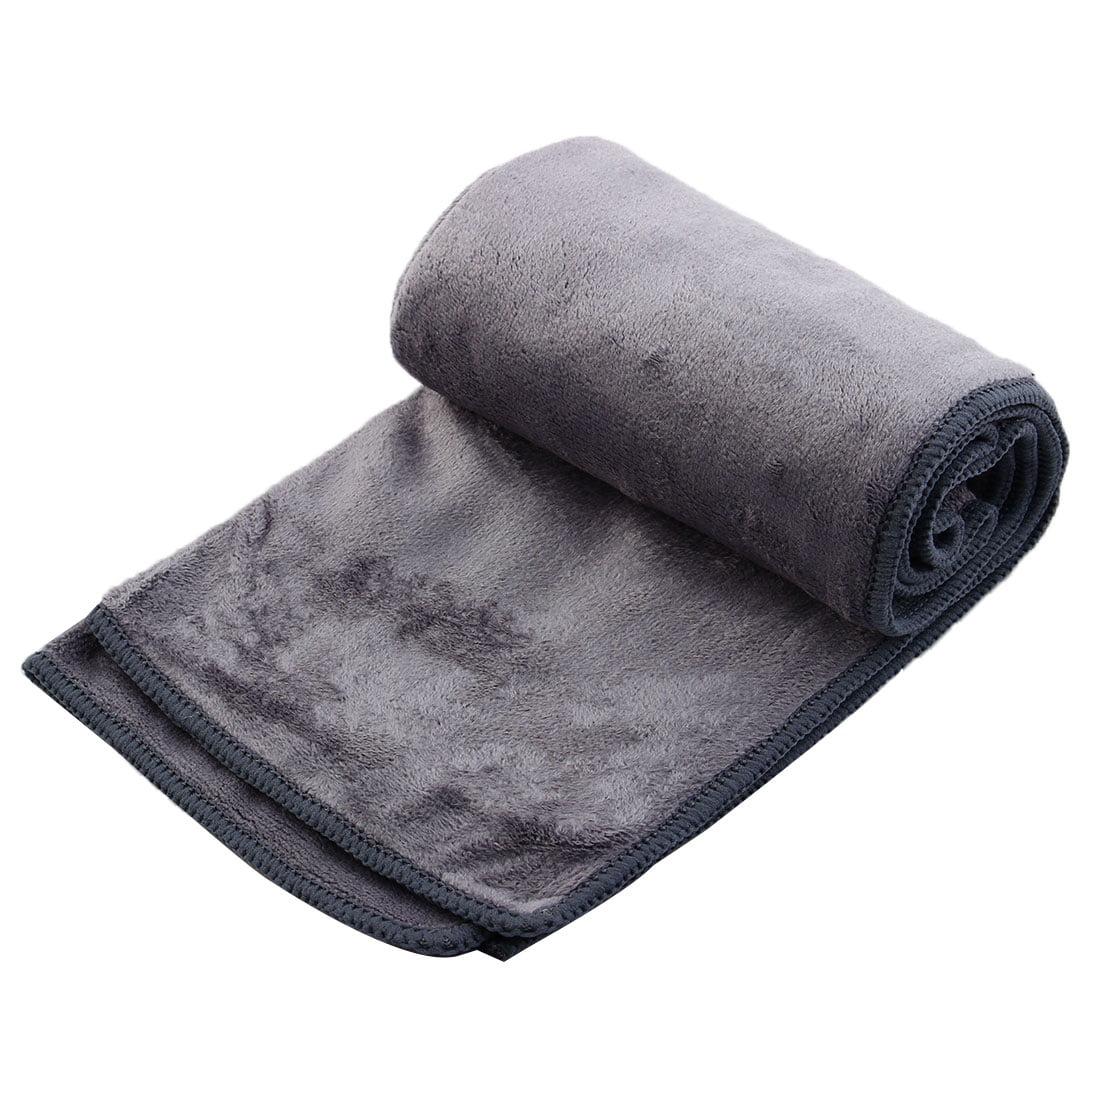 Travel Swimming Hiking Camping Shower Beach Absorbent Quick Drying Towel Gray Walmart Com Walmart Com